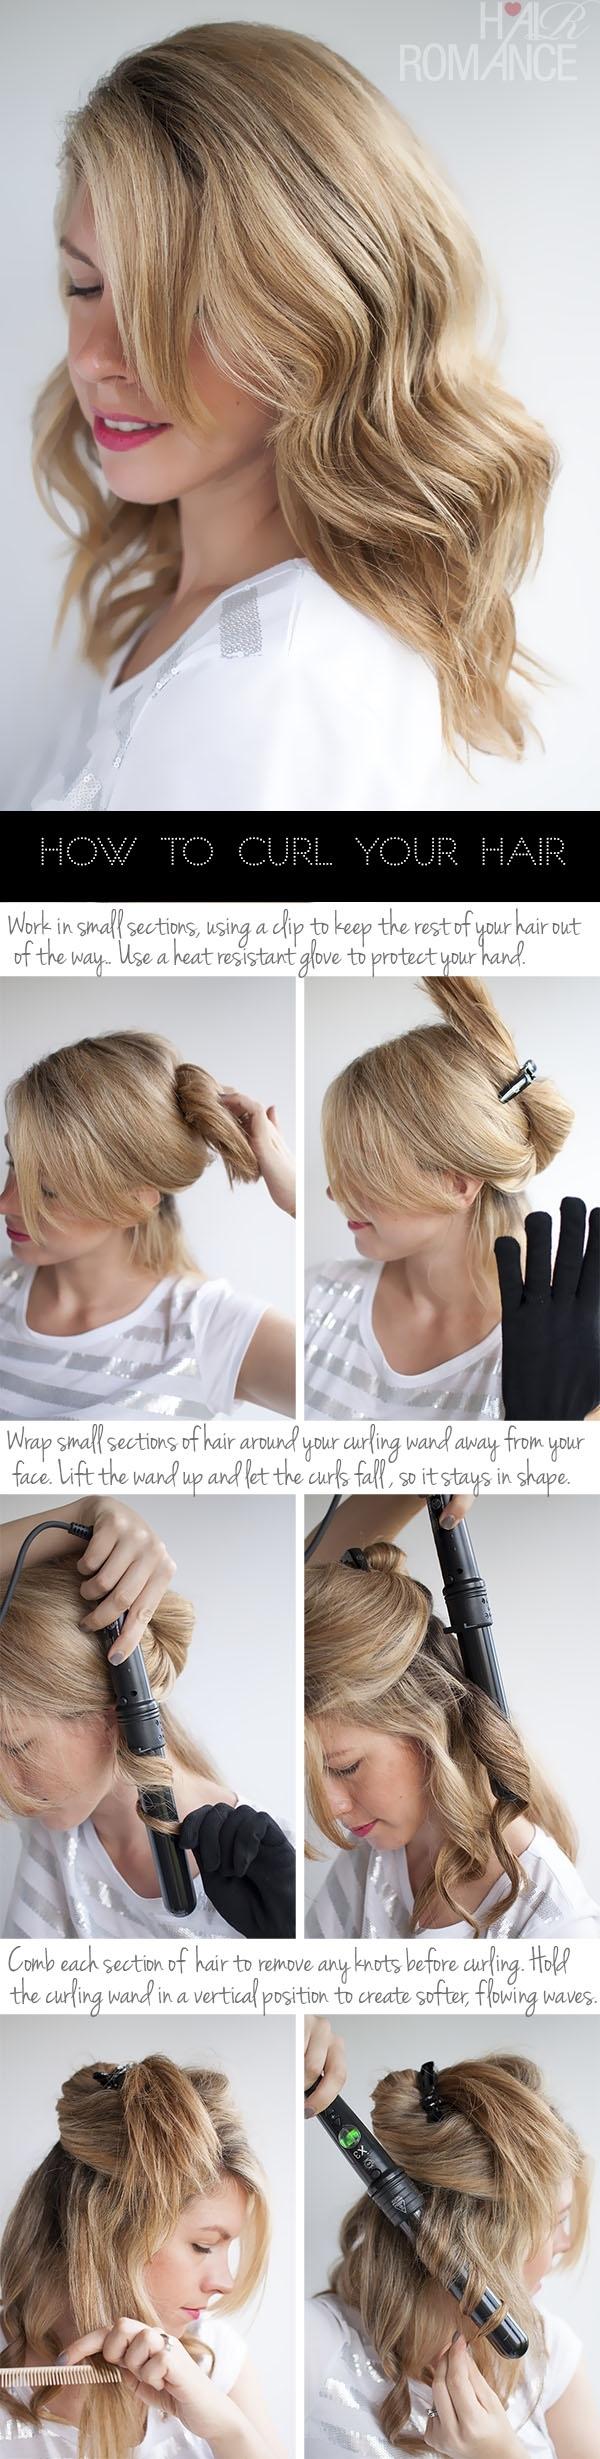 how to create cute wavy hairstyles - wavy haircut